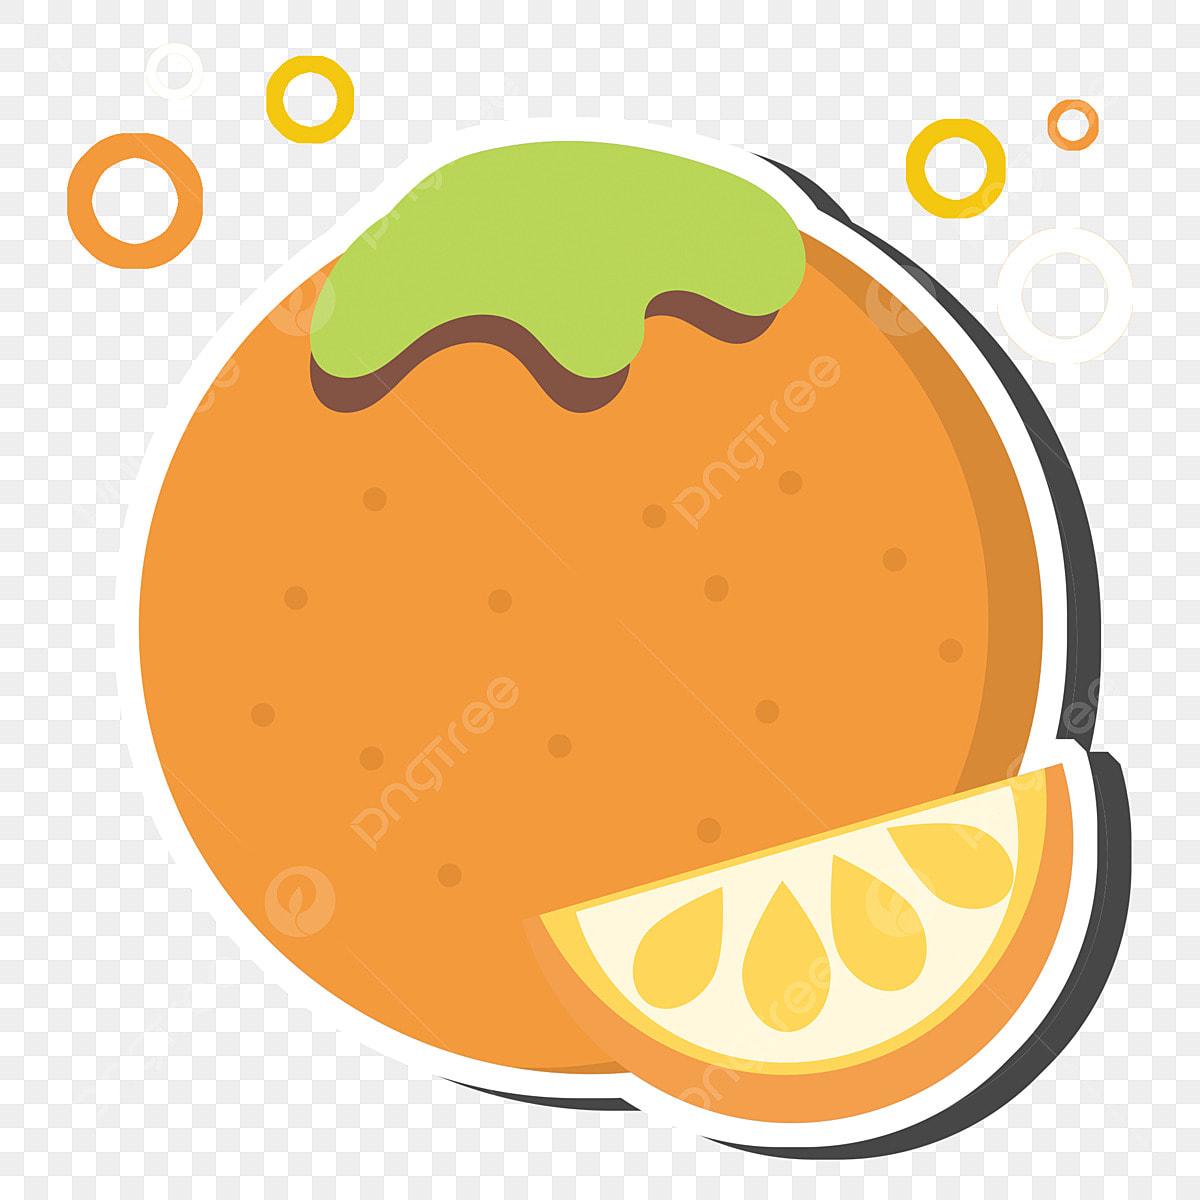 gambar kartun buah kartun oren kartun buah kartun buah kartun kartun png dan psd untuk muat turun percuma https ms pngtree com freepng summer cartoon orange fruit sticker 4613177 html